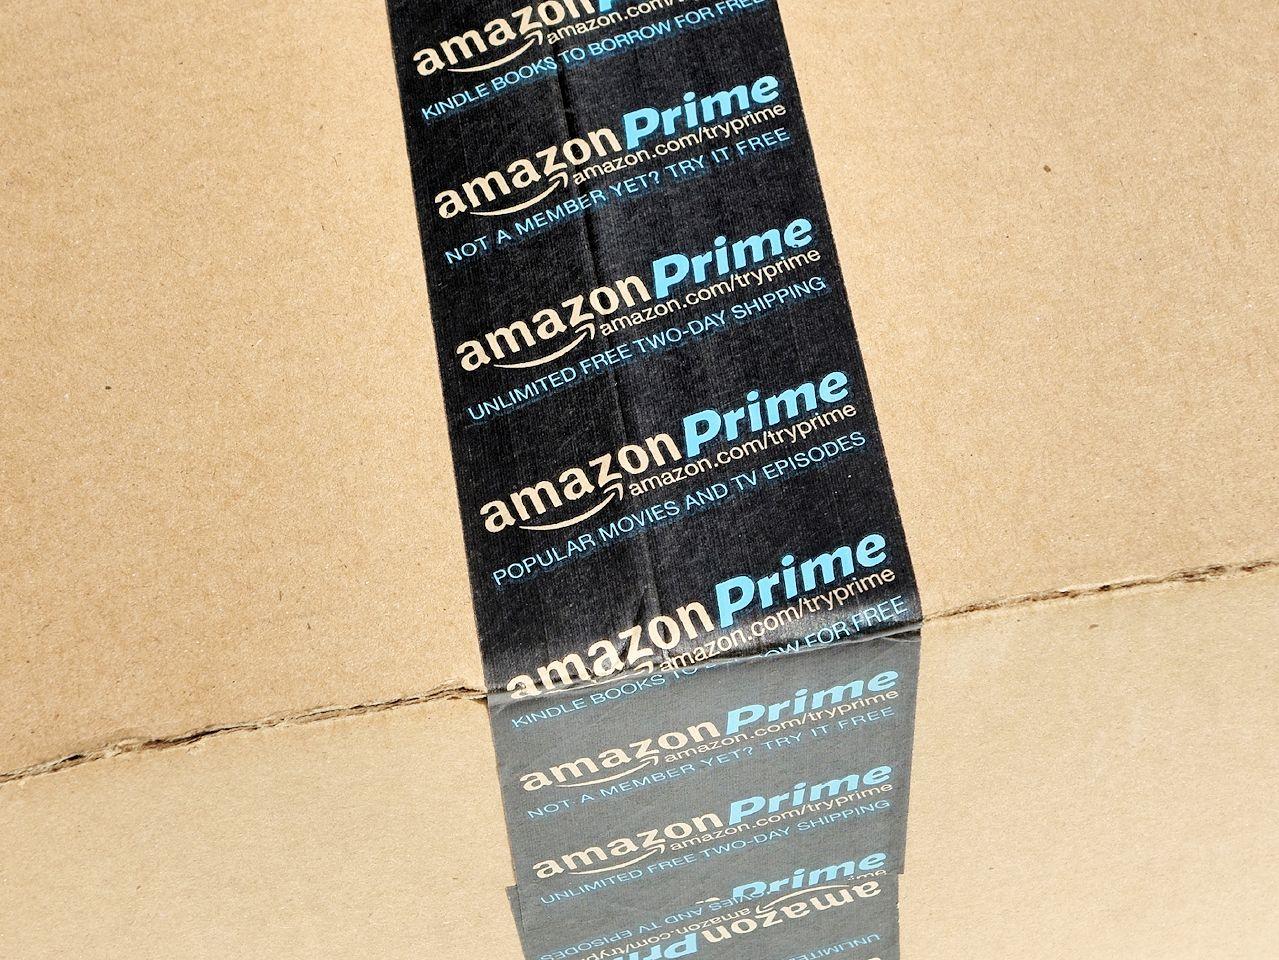 Amazon Has at Least 46 Million Prime Members Worldwide